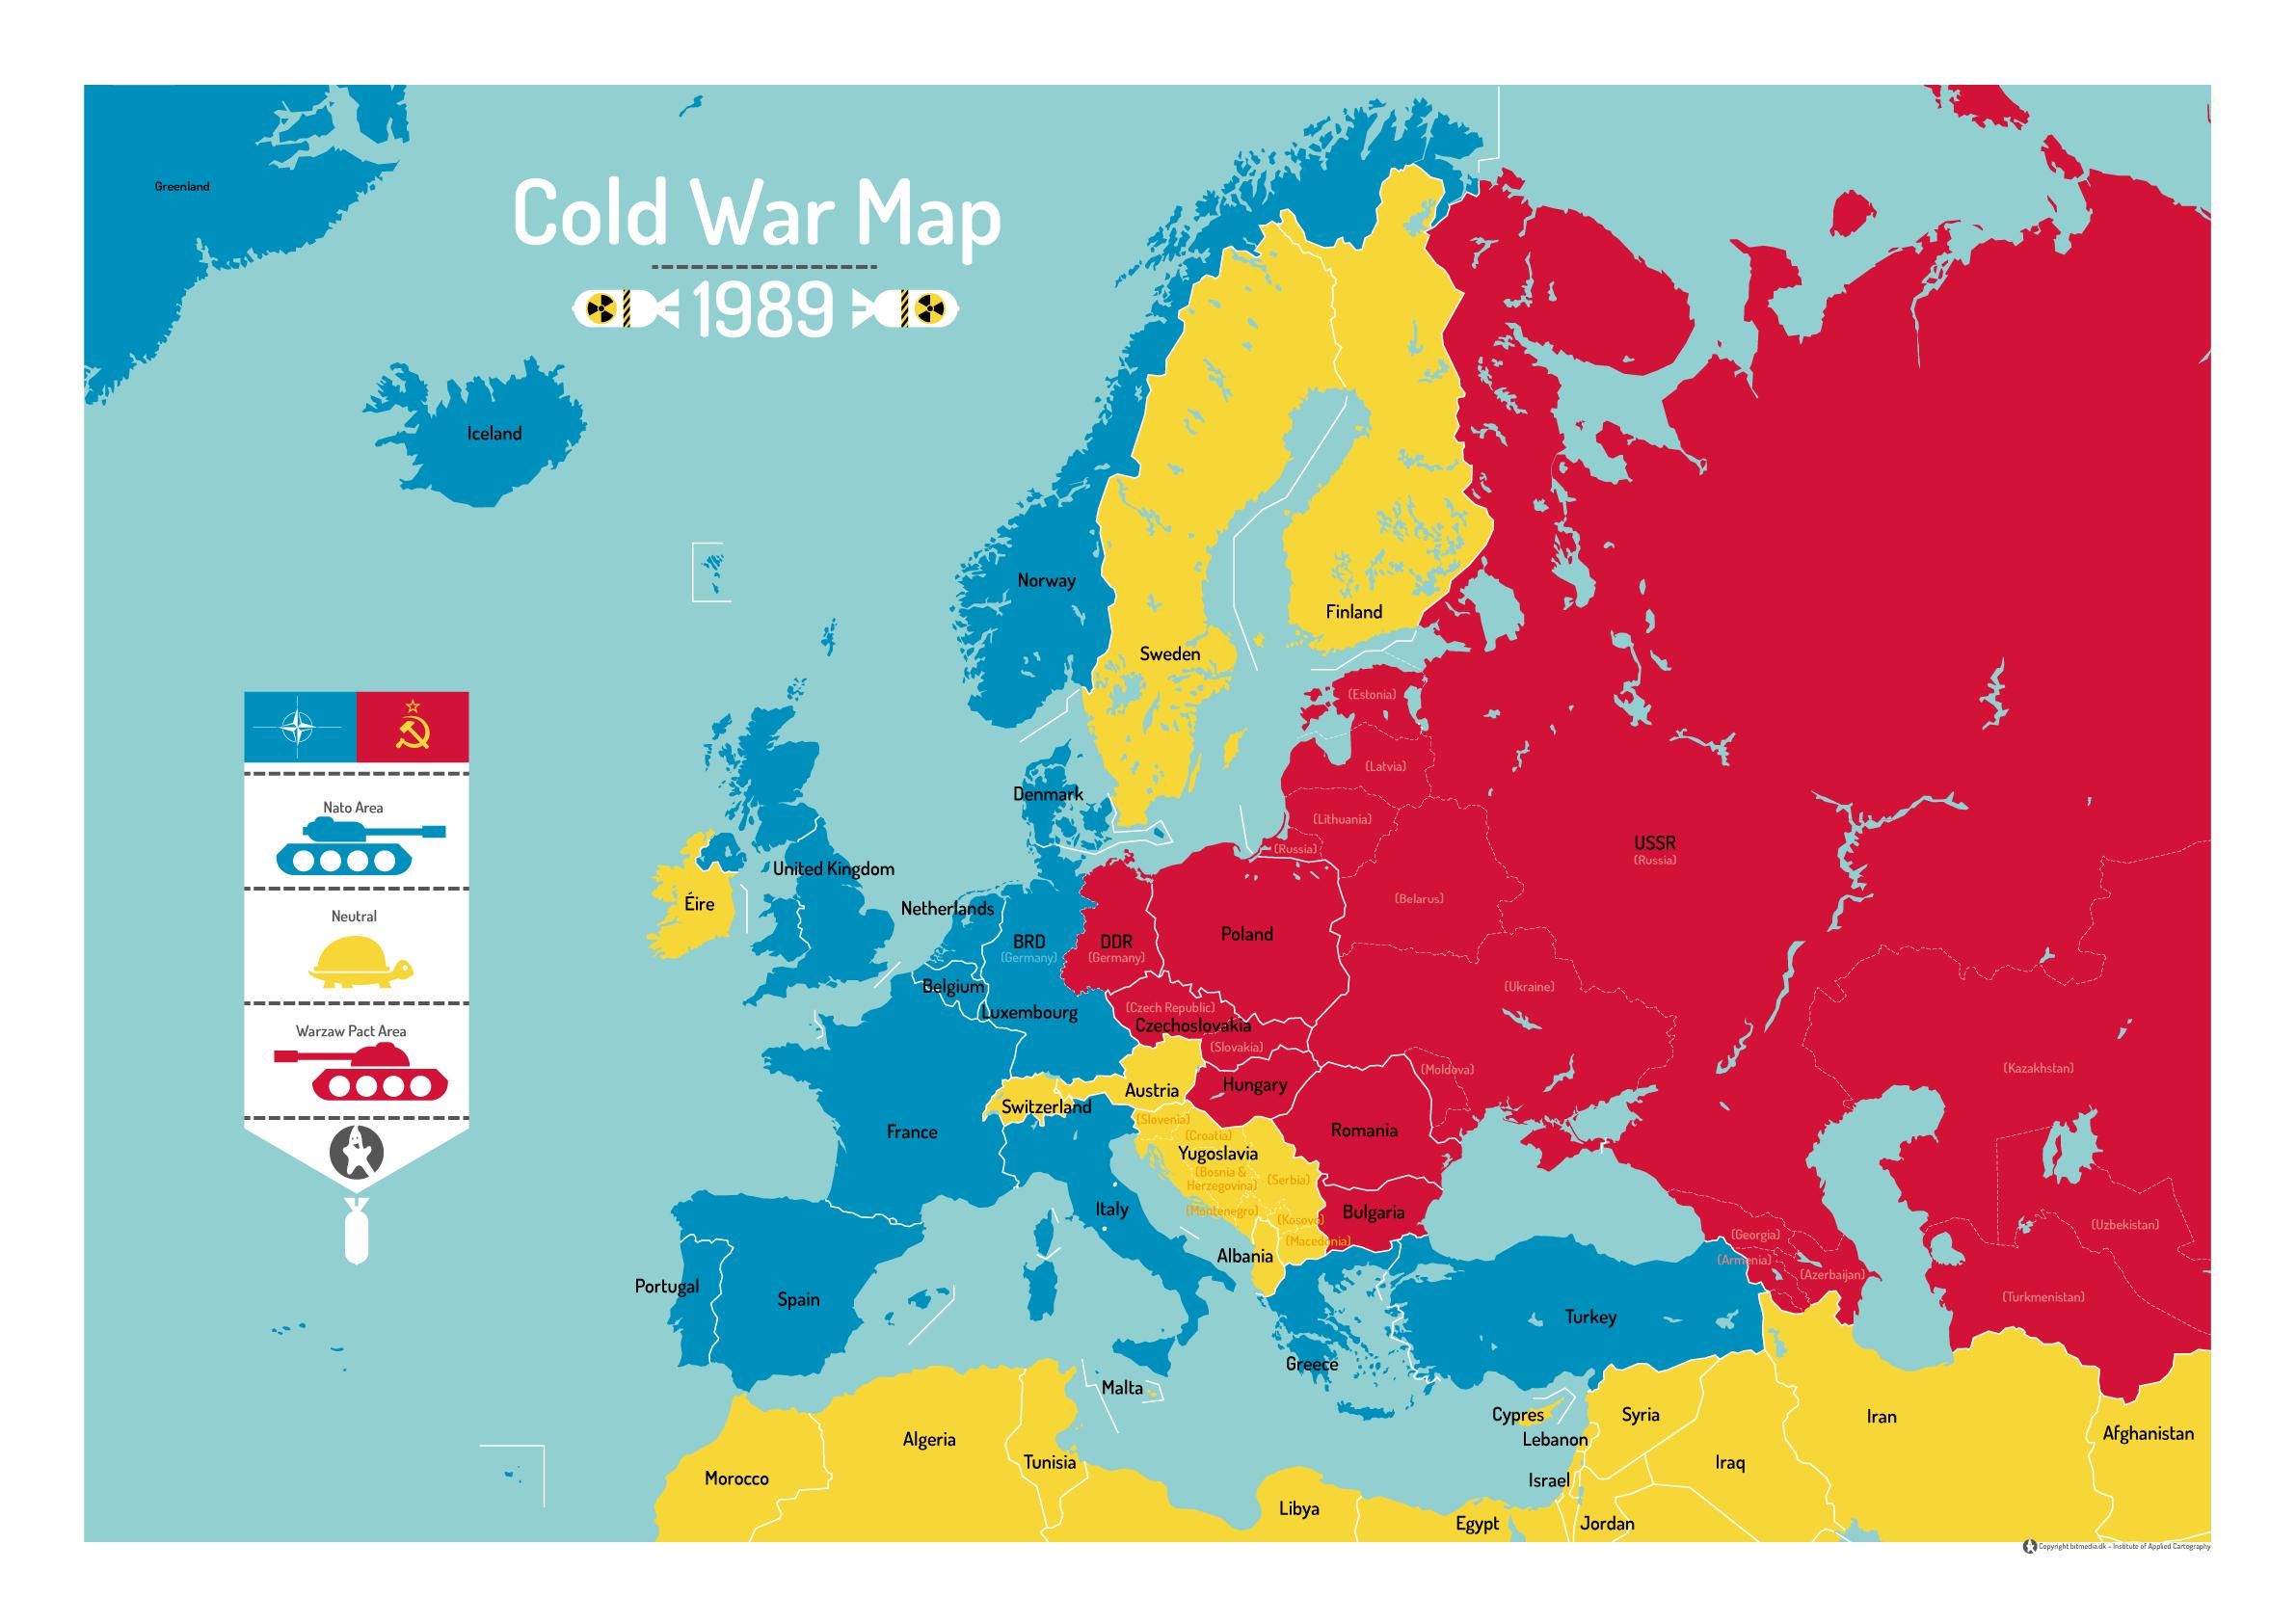 Kort over den kolde krig anno 1989 - Bitmedia